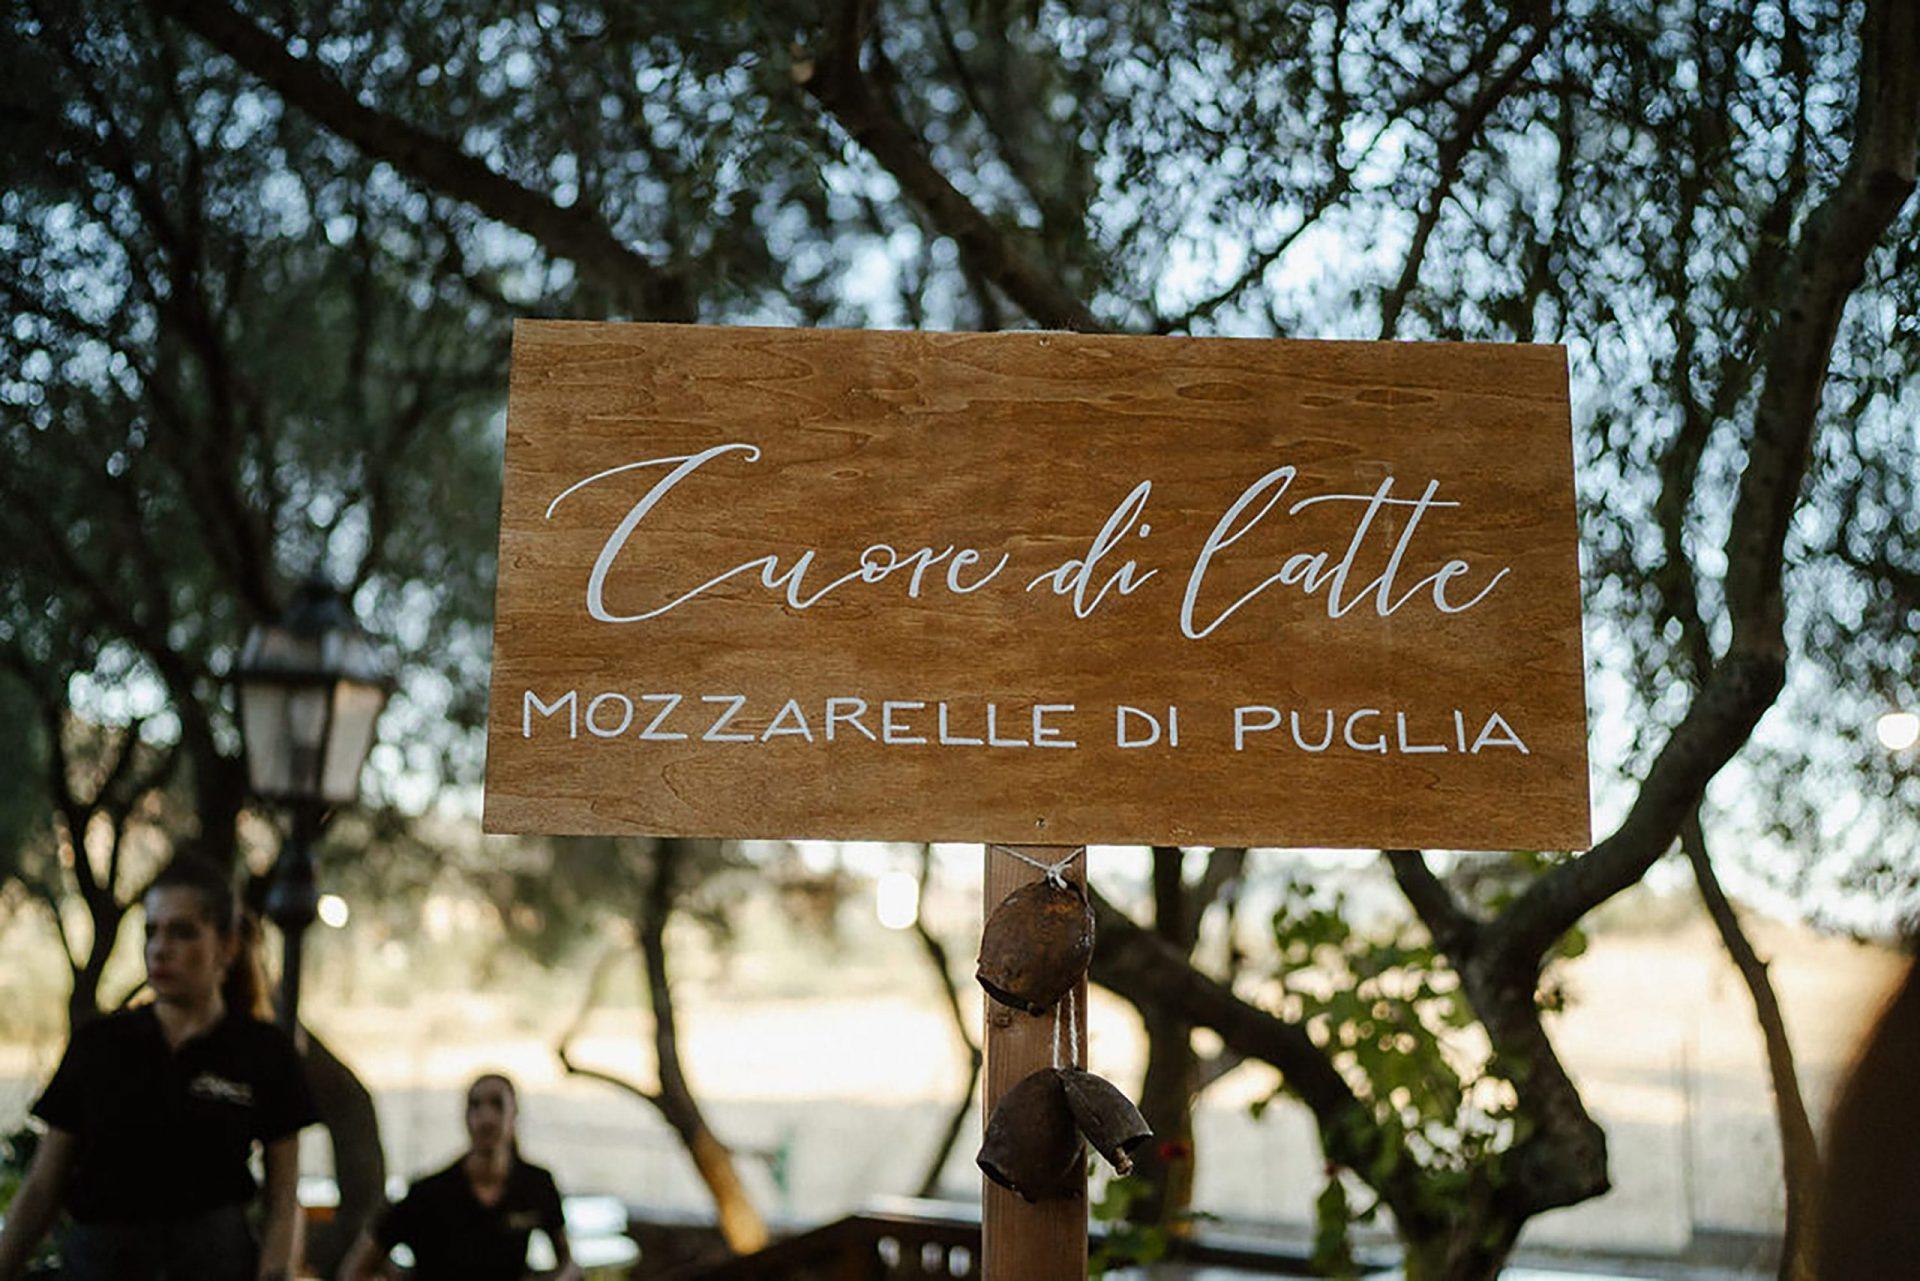 Marianna & Matteo, Apulia mozzarella buffet